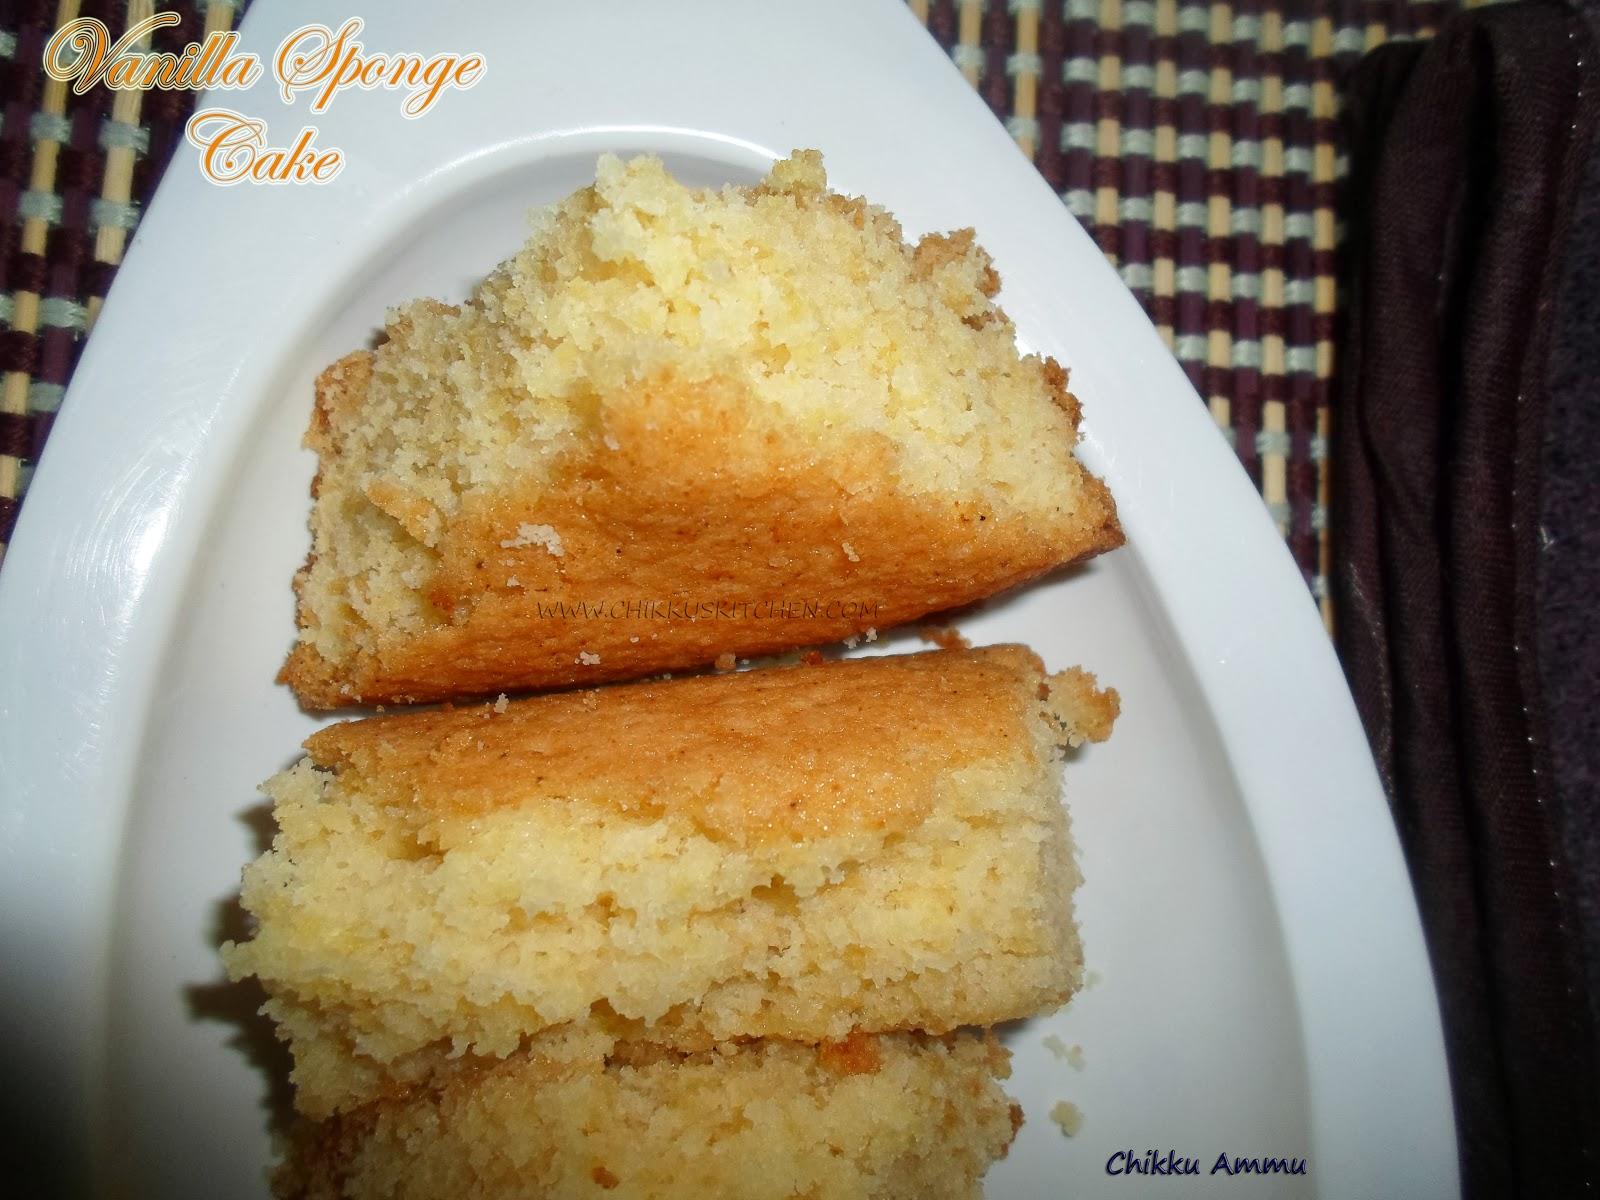 Chikkus kitchen vanilla sponge cake recipe basic for Basic vanilla sponge